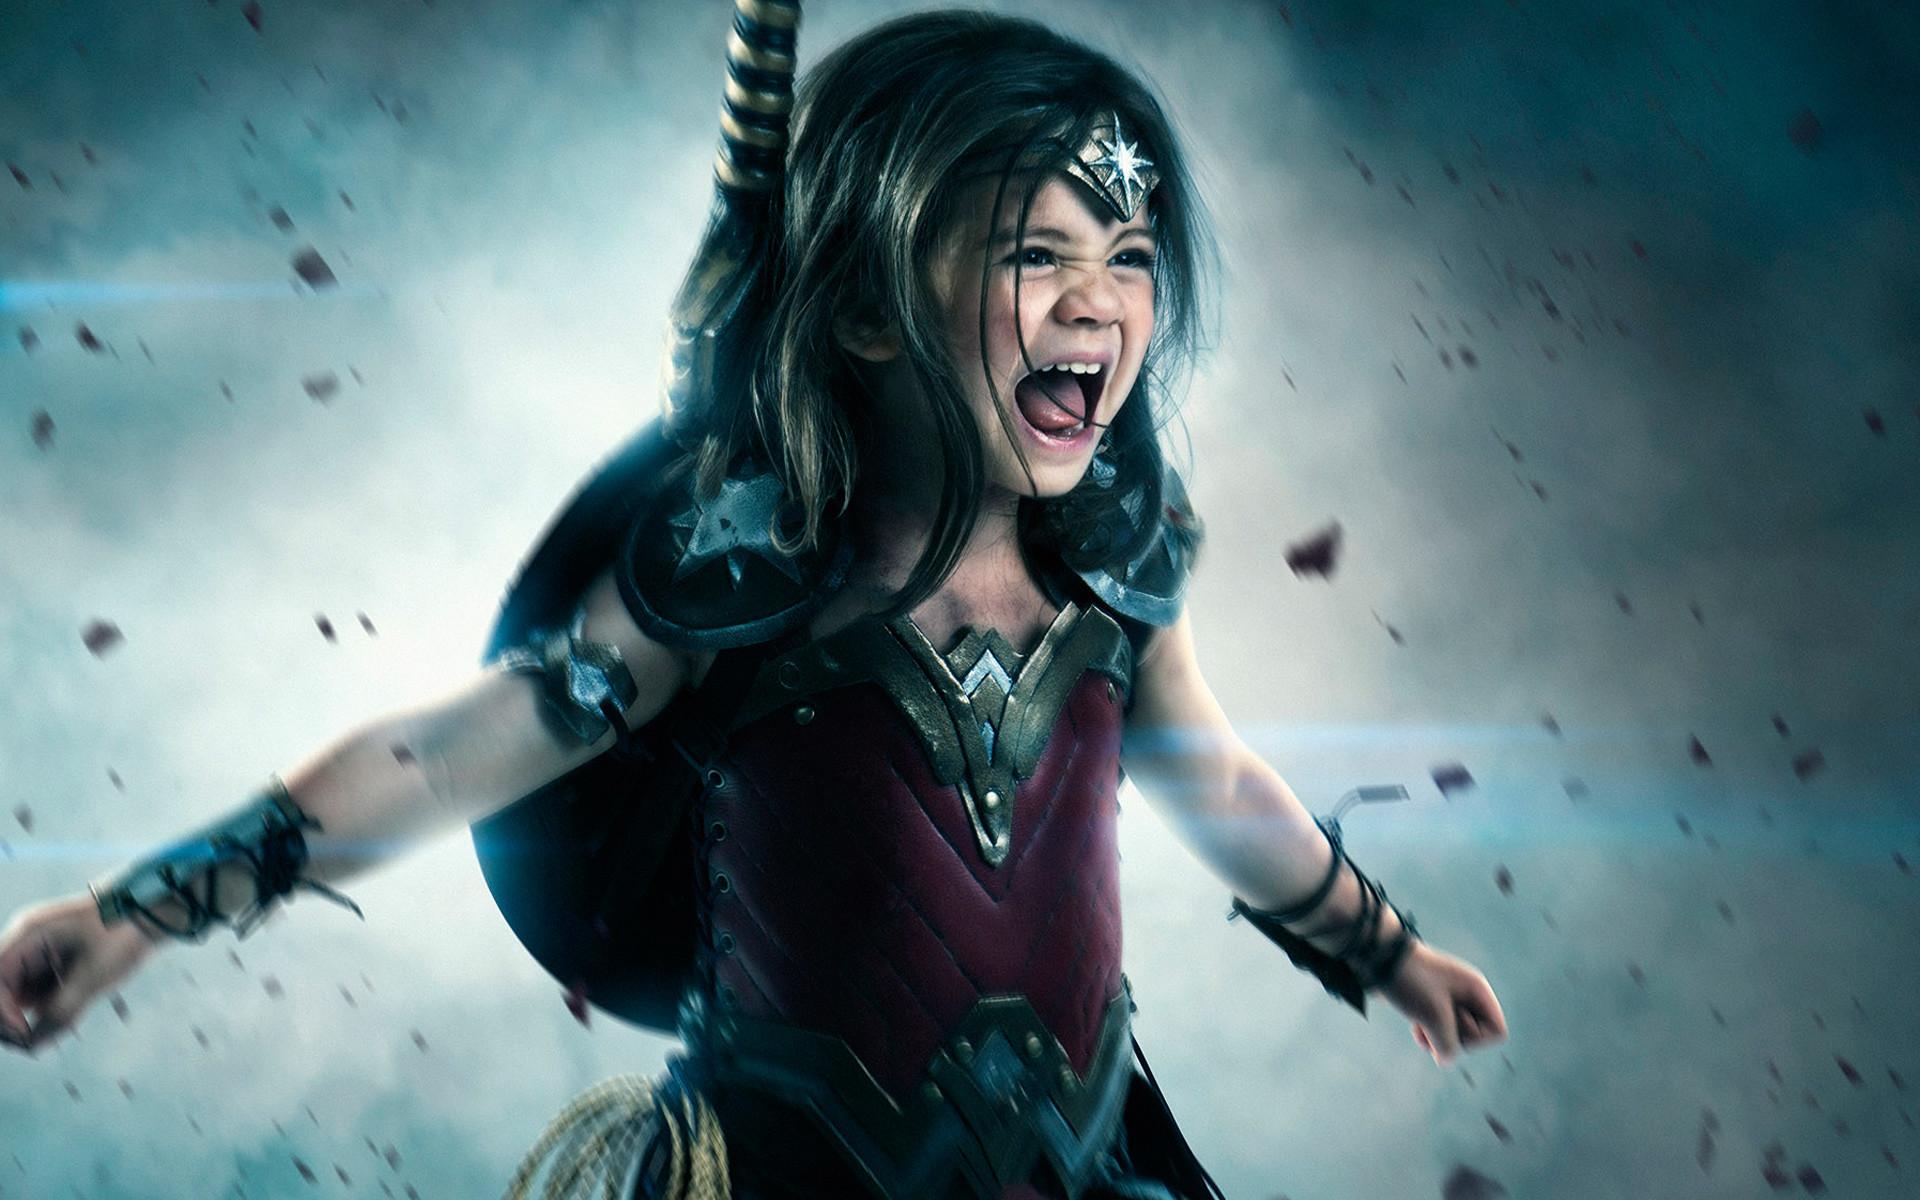 Res: 1920x1200, Tags: Cute Wonder Woman